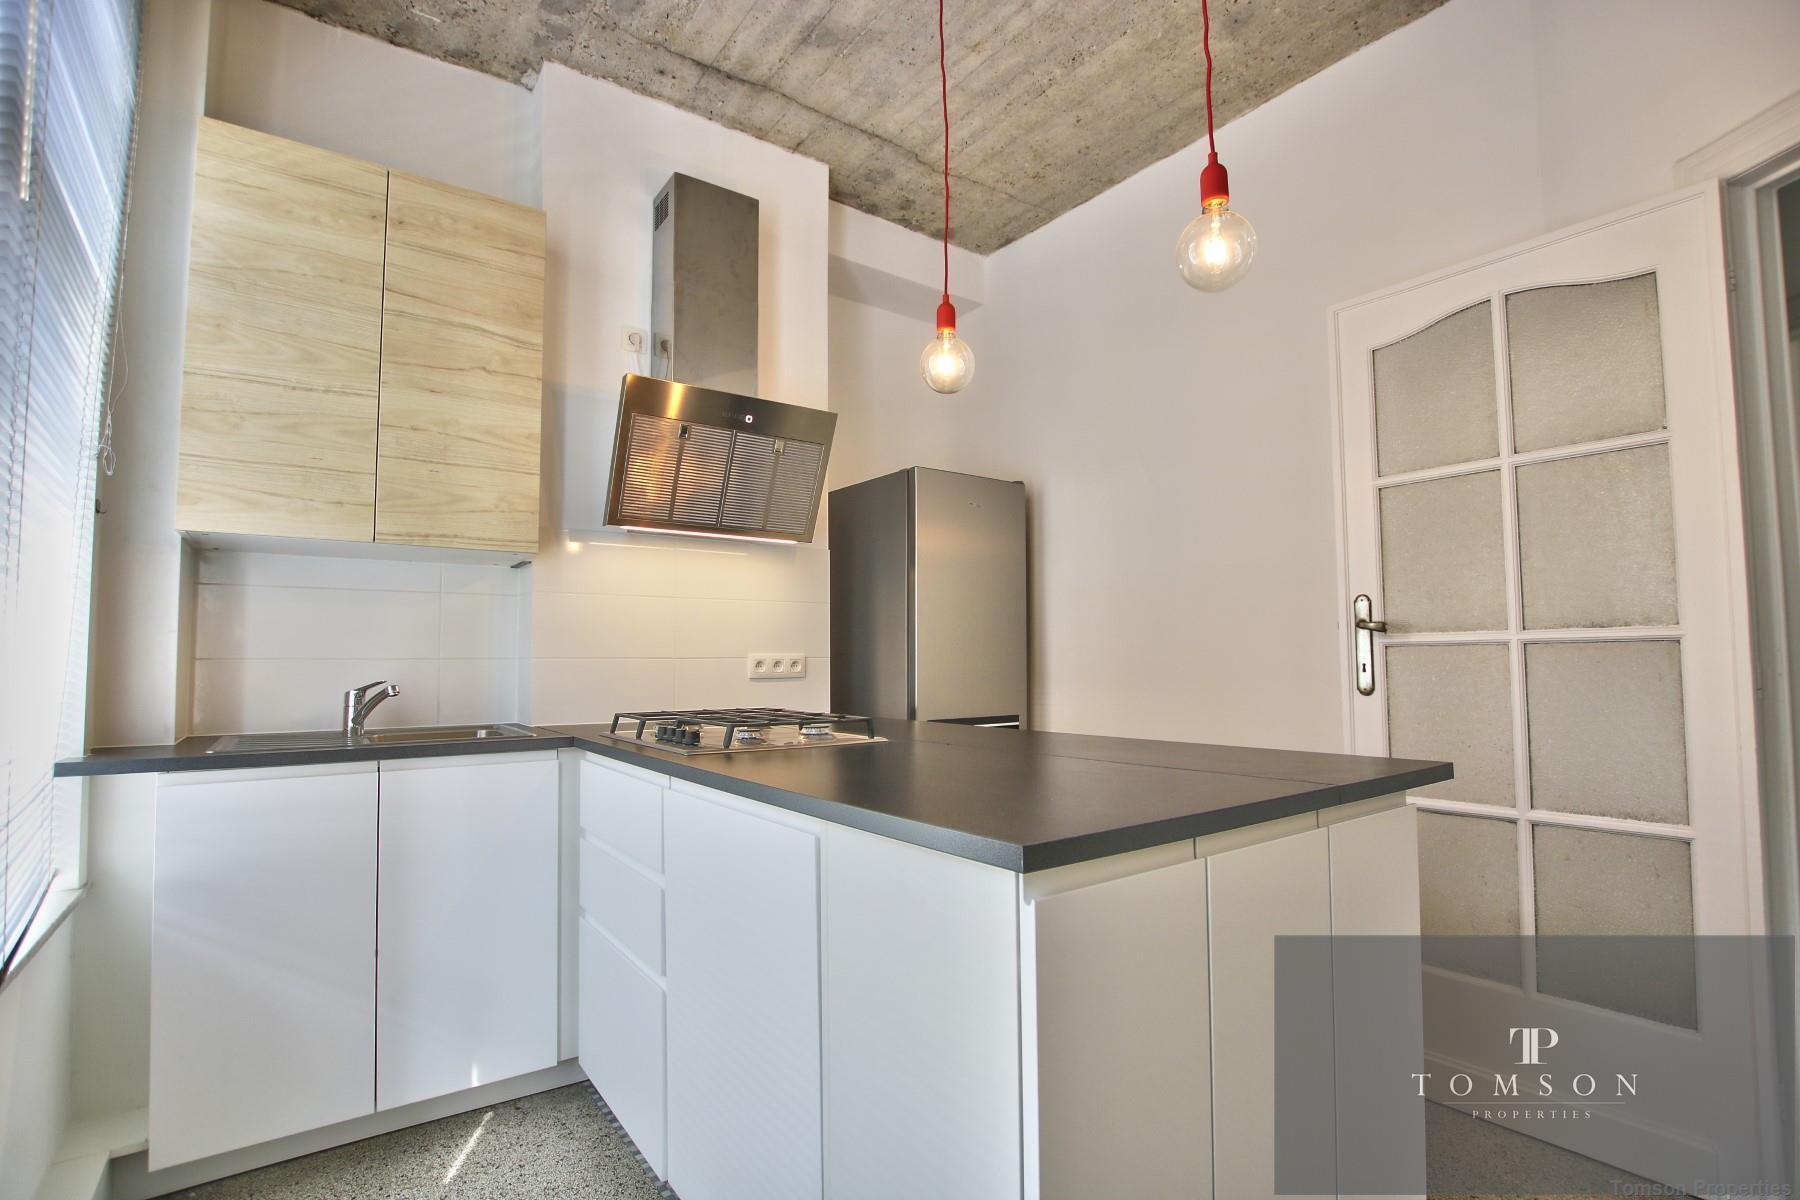 Flat - Etterbeek - #4313596-4